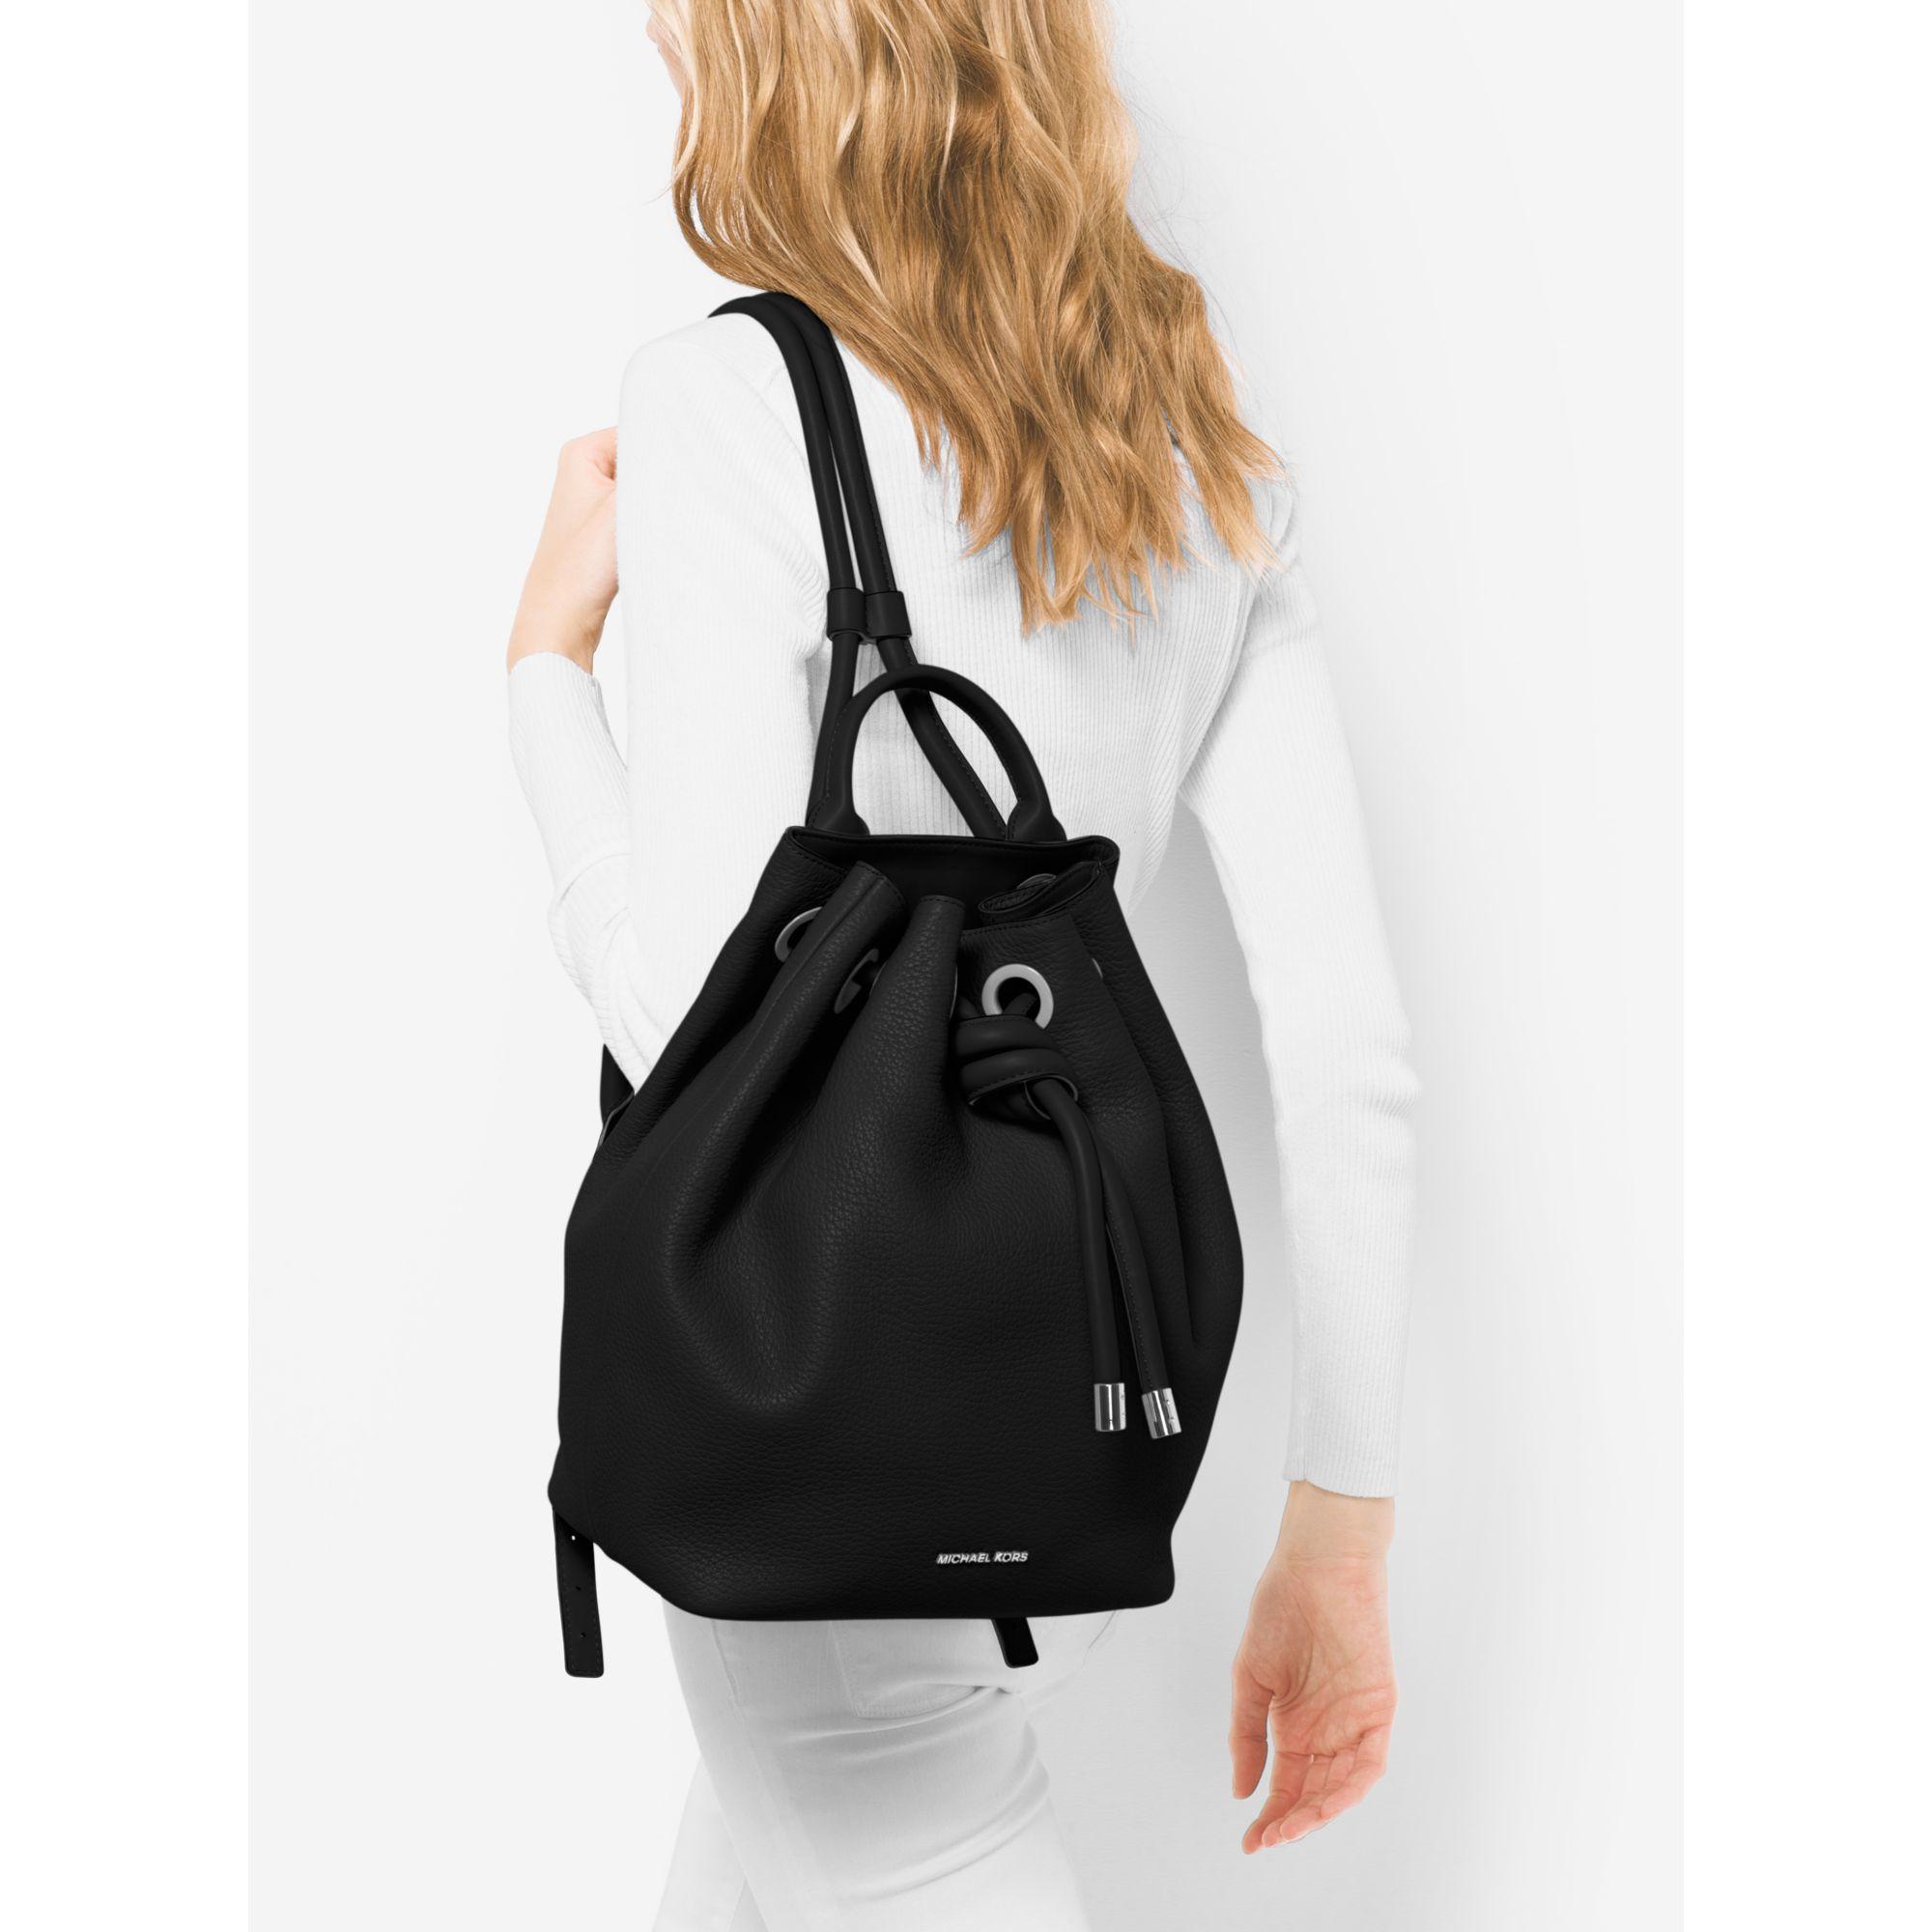 835236b76c40 Viv Large Leather Backpack Michael Kors- Fenix Toulouse Handball